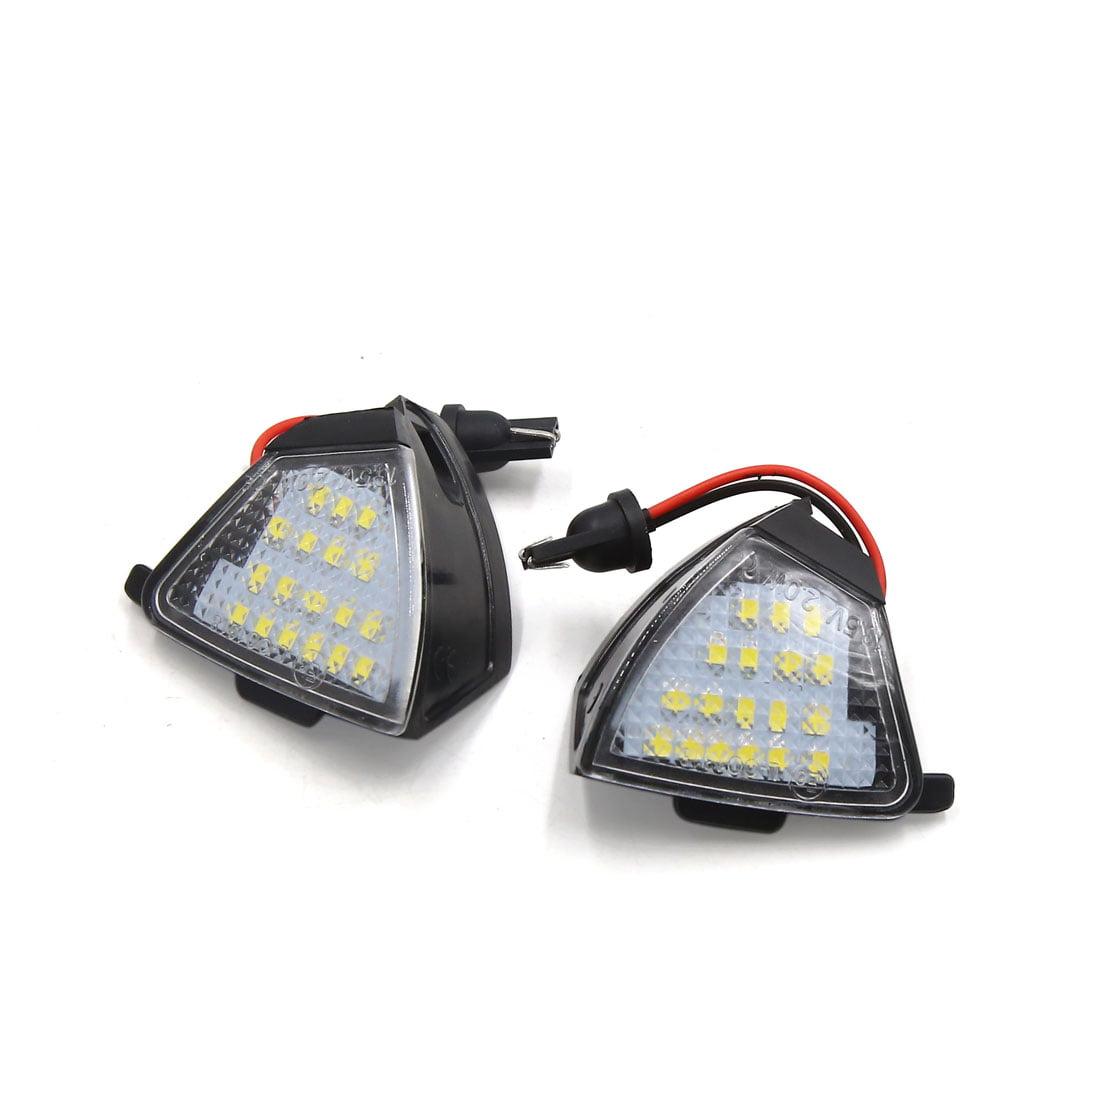 2pcs 13.5V Car White LED Under Side Mirror Welcome Light Puddle Lamp for VW - image 3 of 3